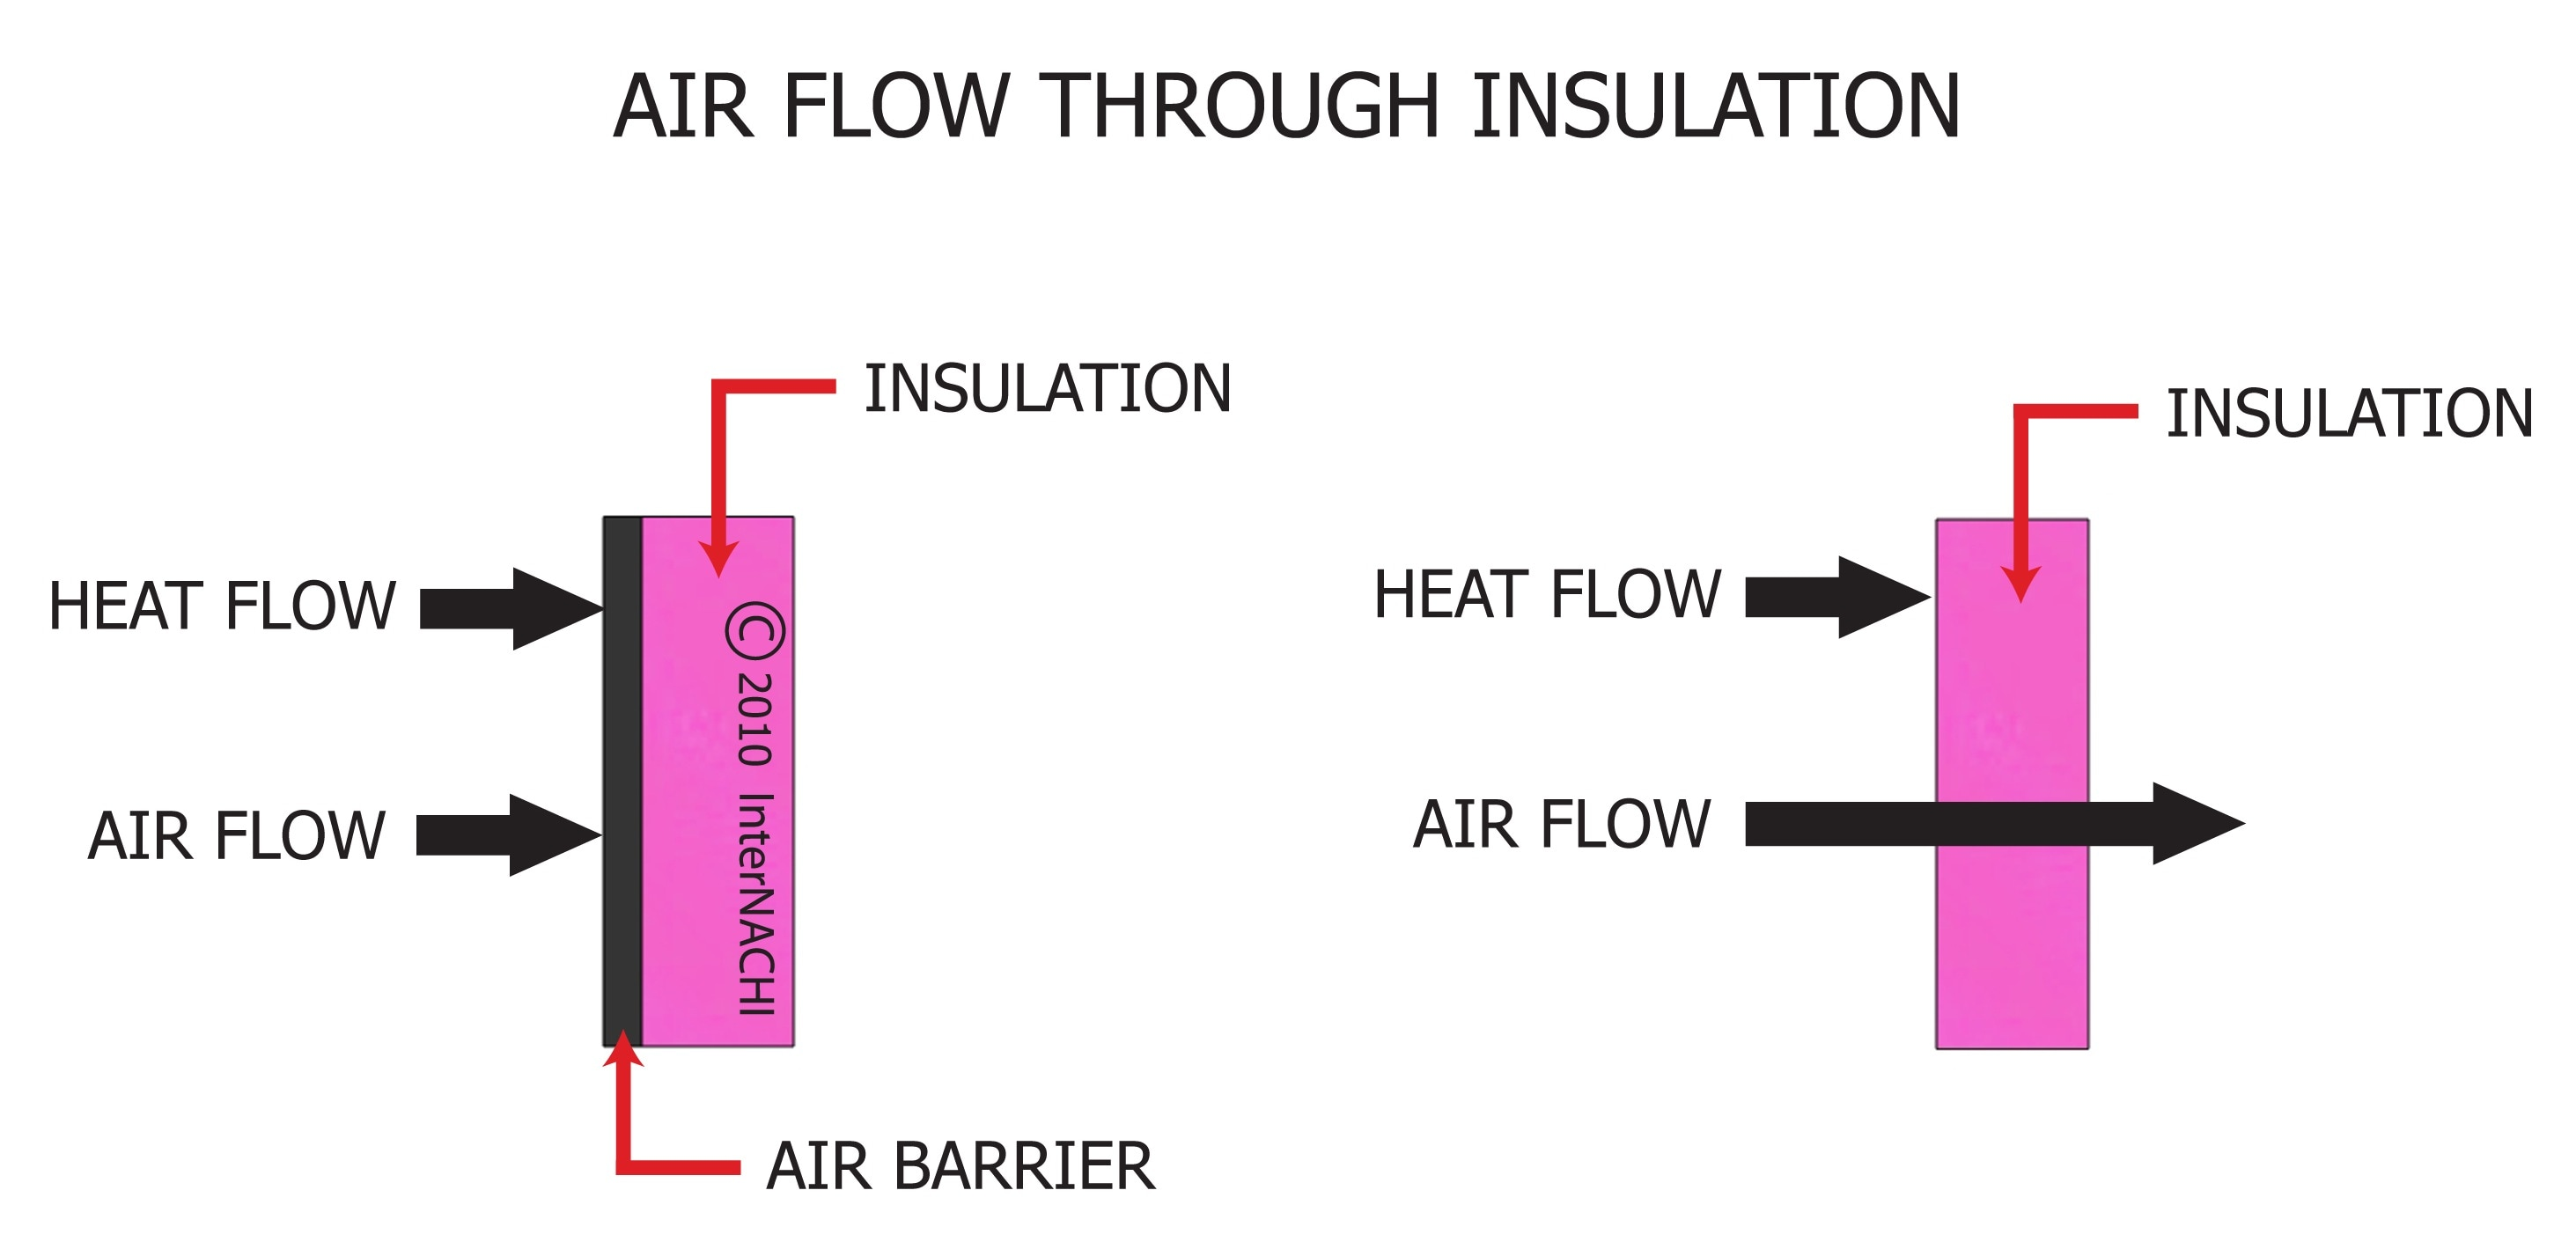 Air flow through insulation.